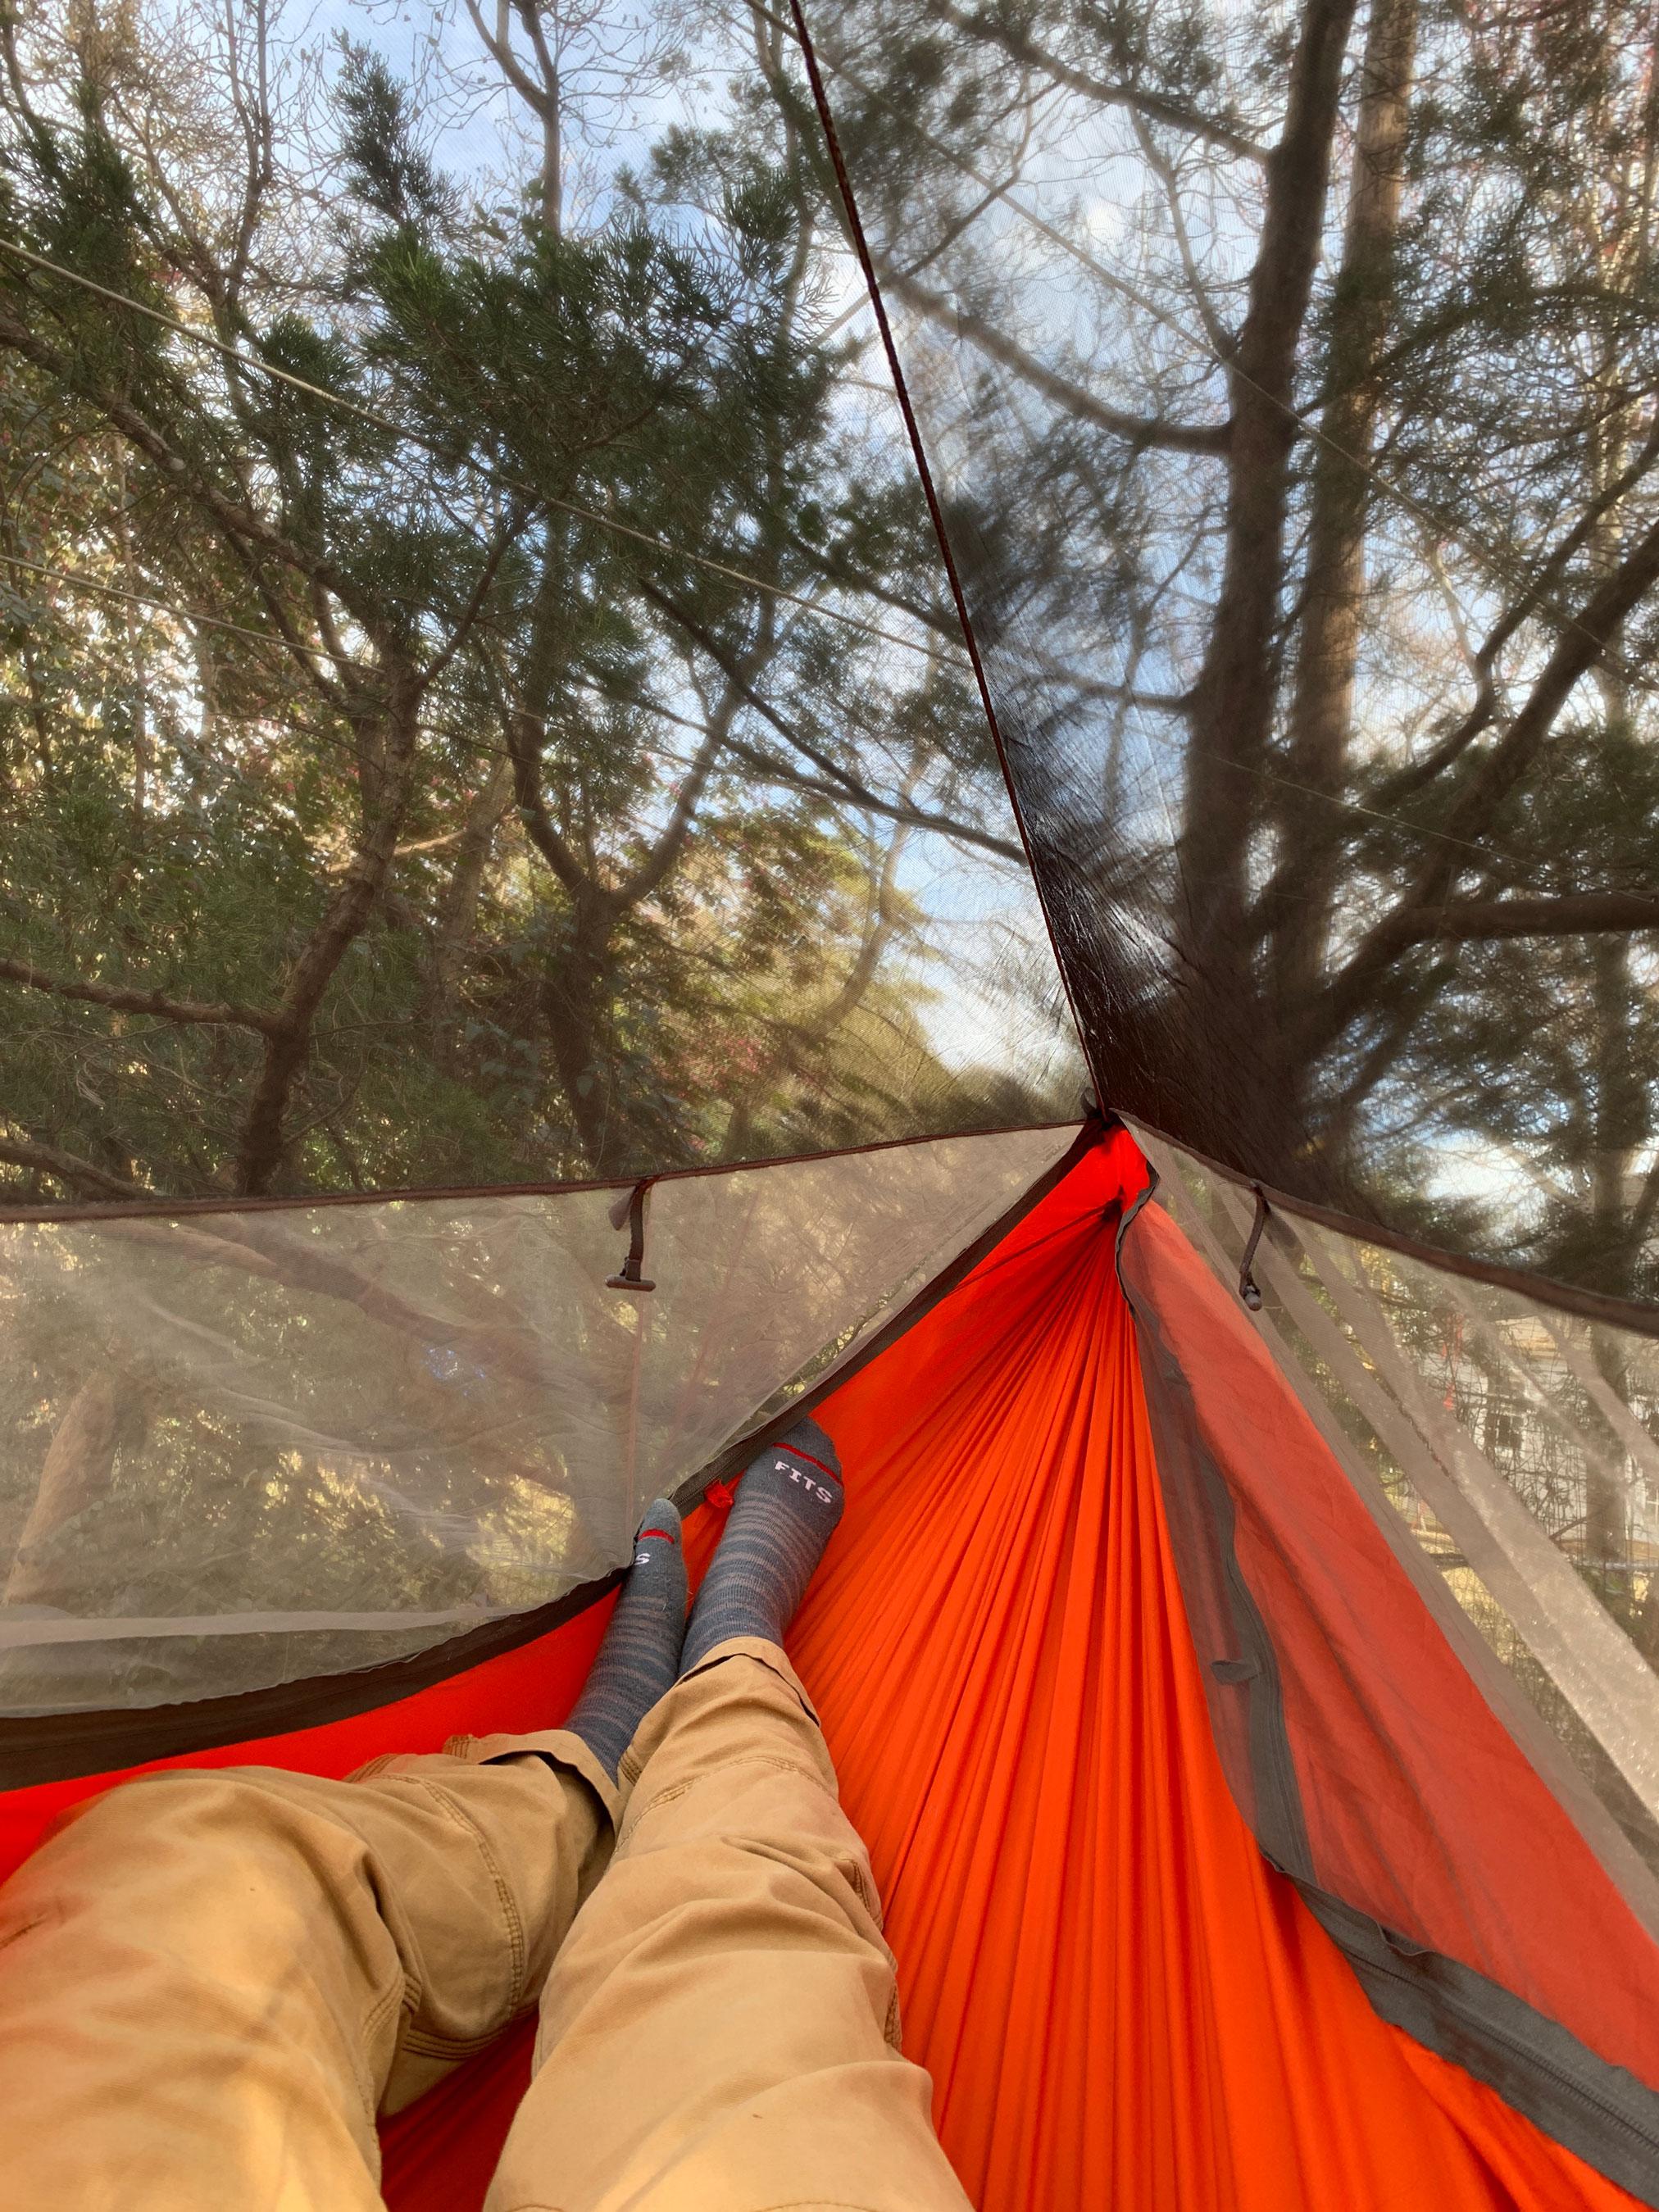 Kammock Mantis all-in-one hammock system